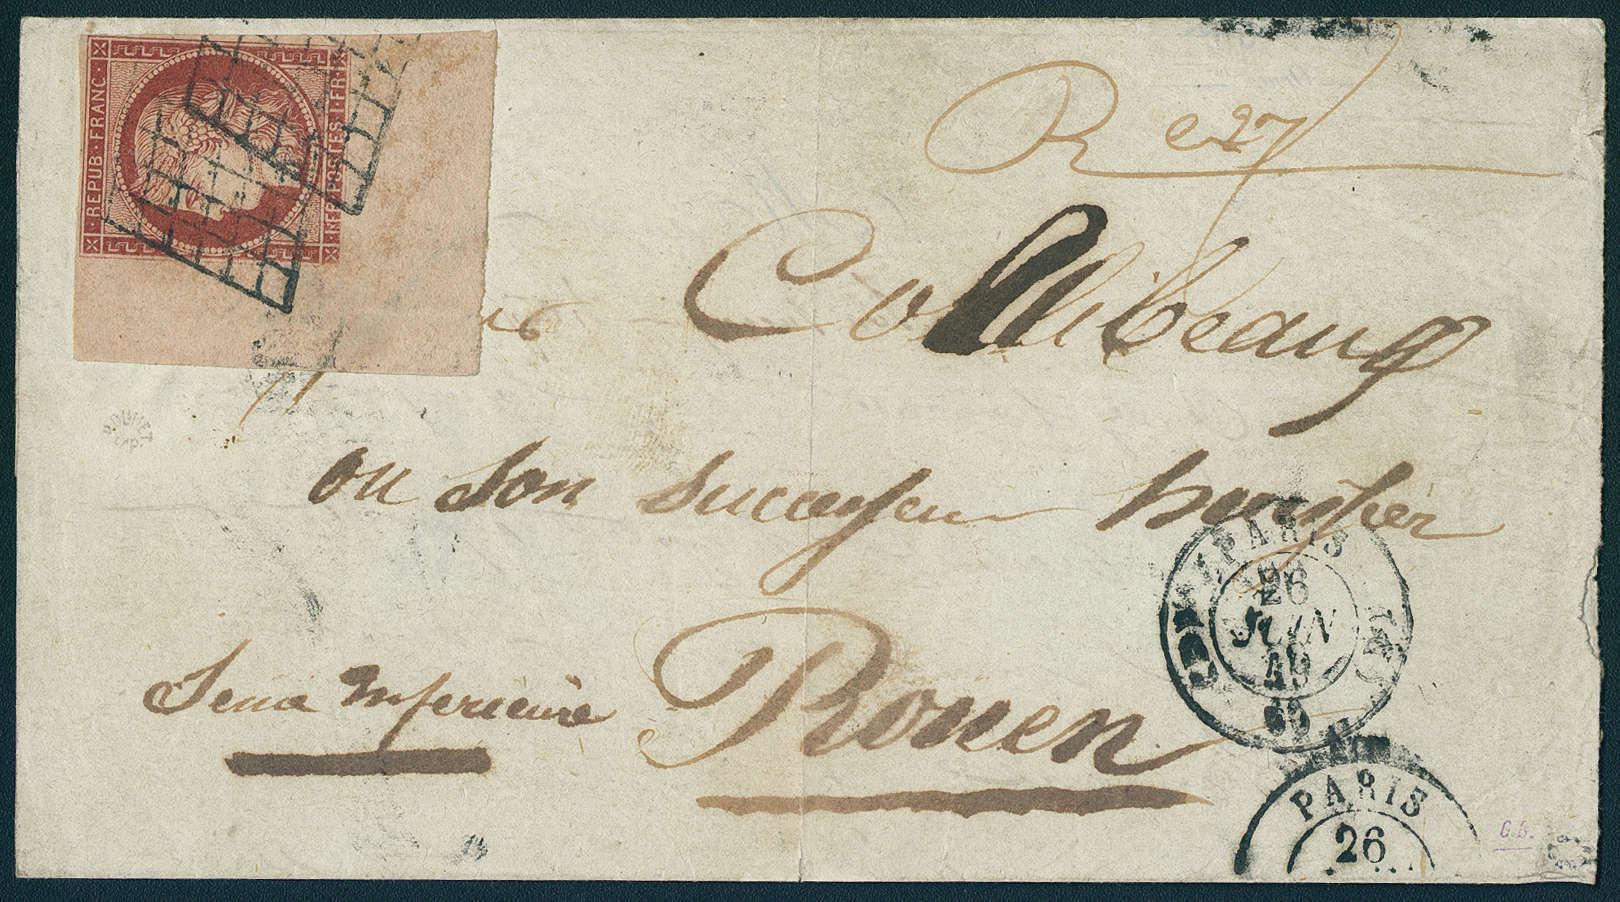 Frankreich - 1 Franc Vermillon, rotbraun, auf Brief